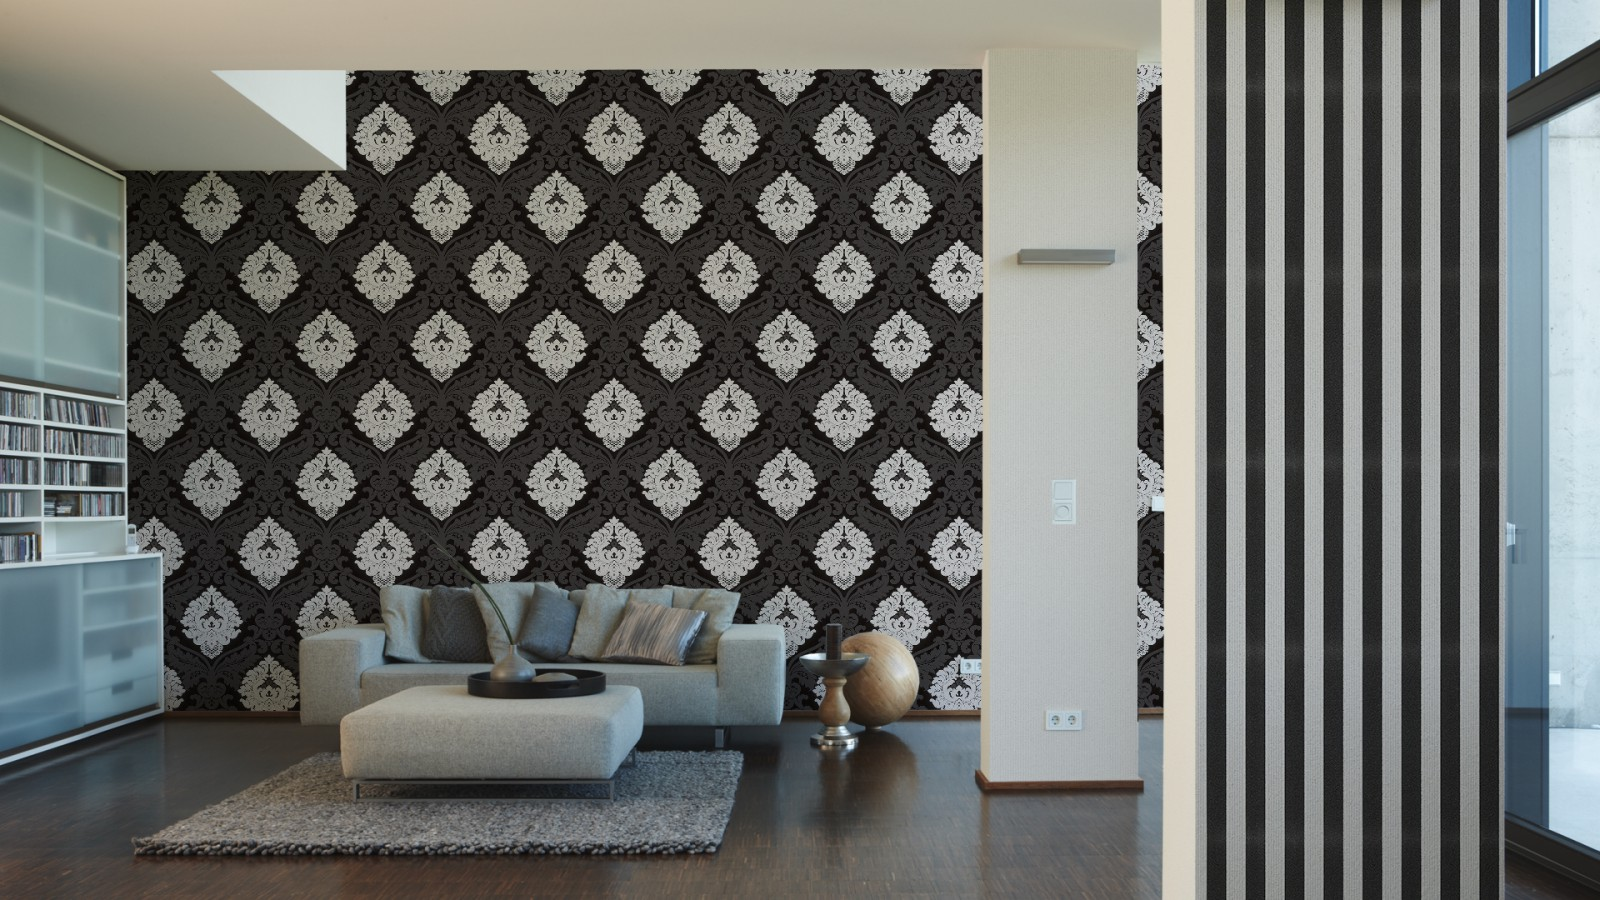 wallpaper bling bling baroque glitter black 3139 59. Black Bedroom Furniture Sets. Home Design Ideas